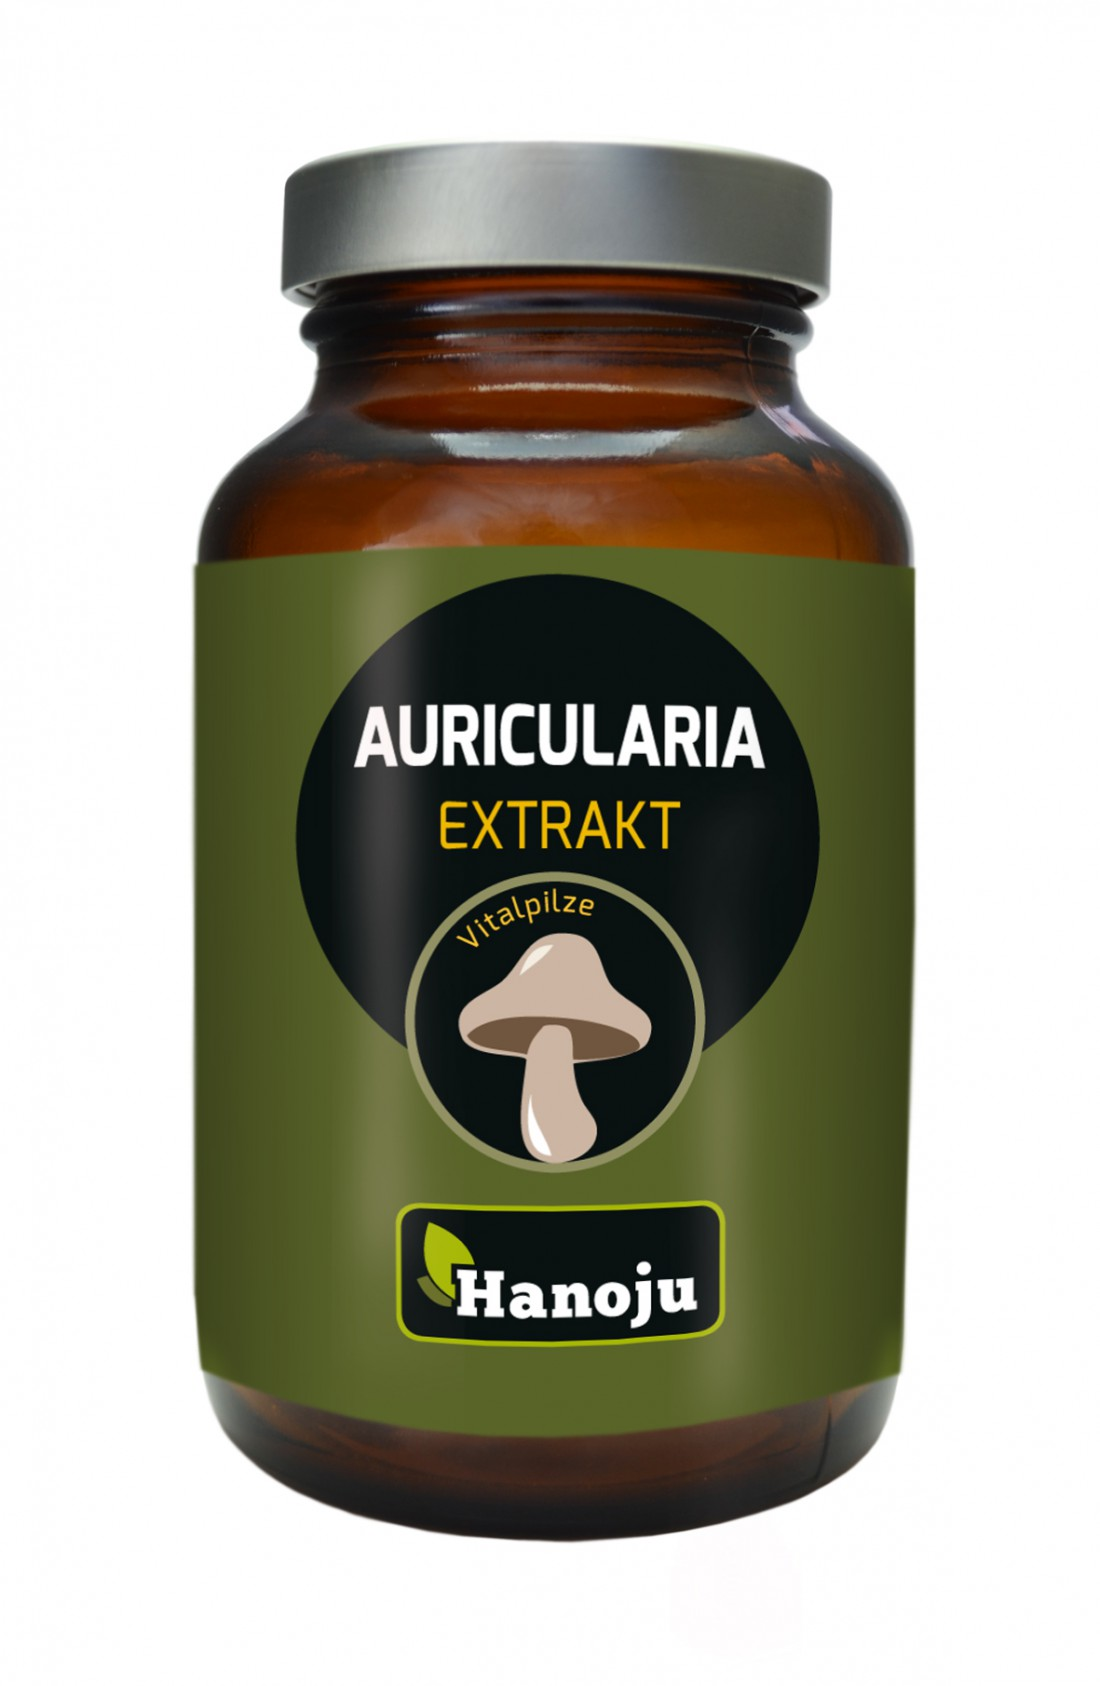 Oreille de Judas - Auricularia - Extrait de Champignon - 450 mg - 90 comprimés